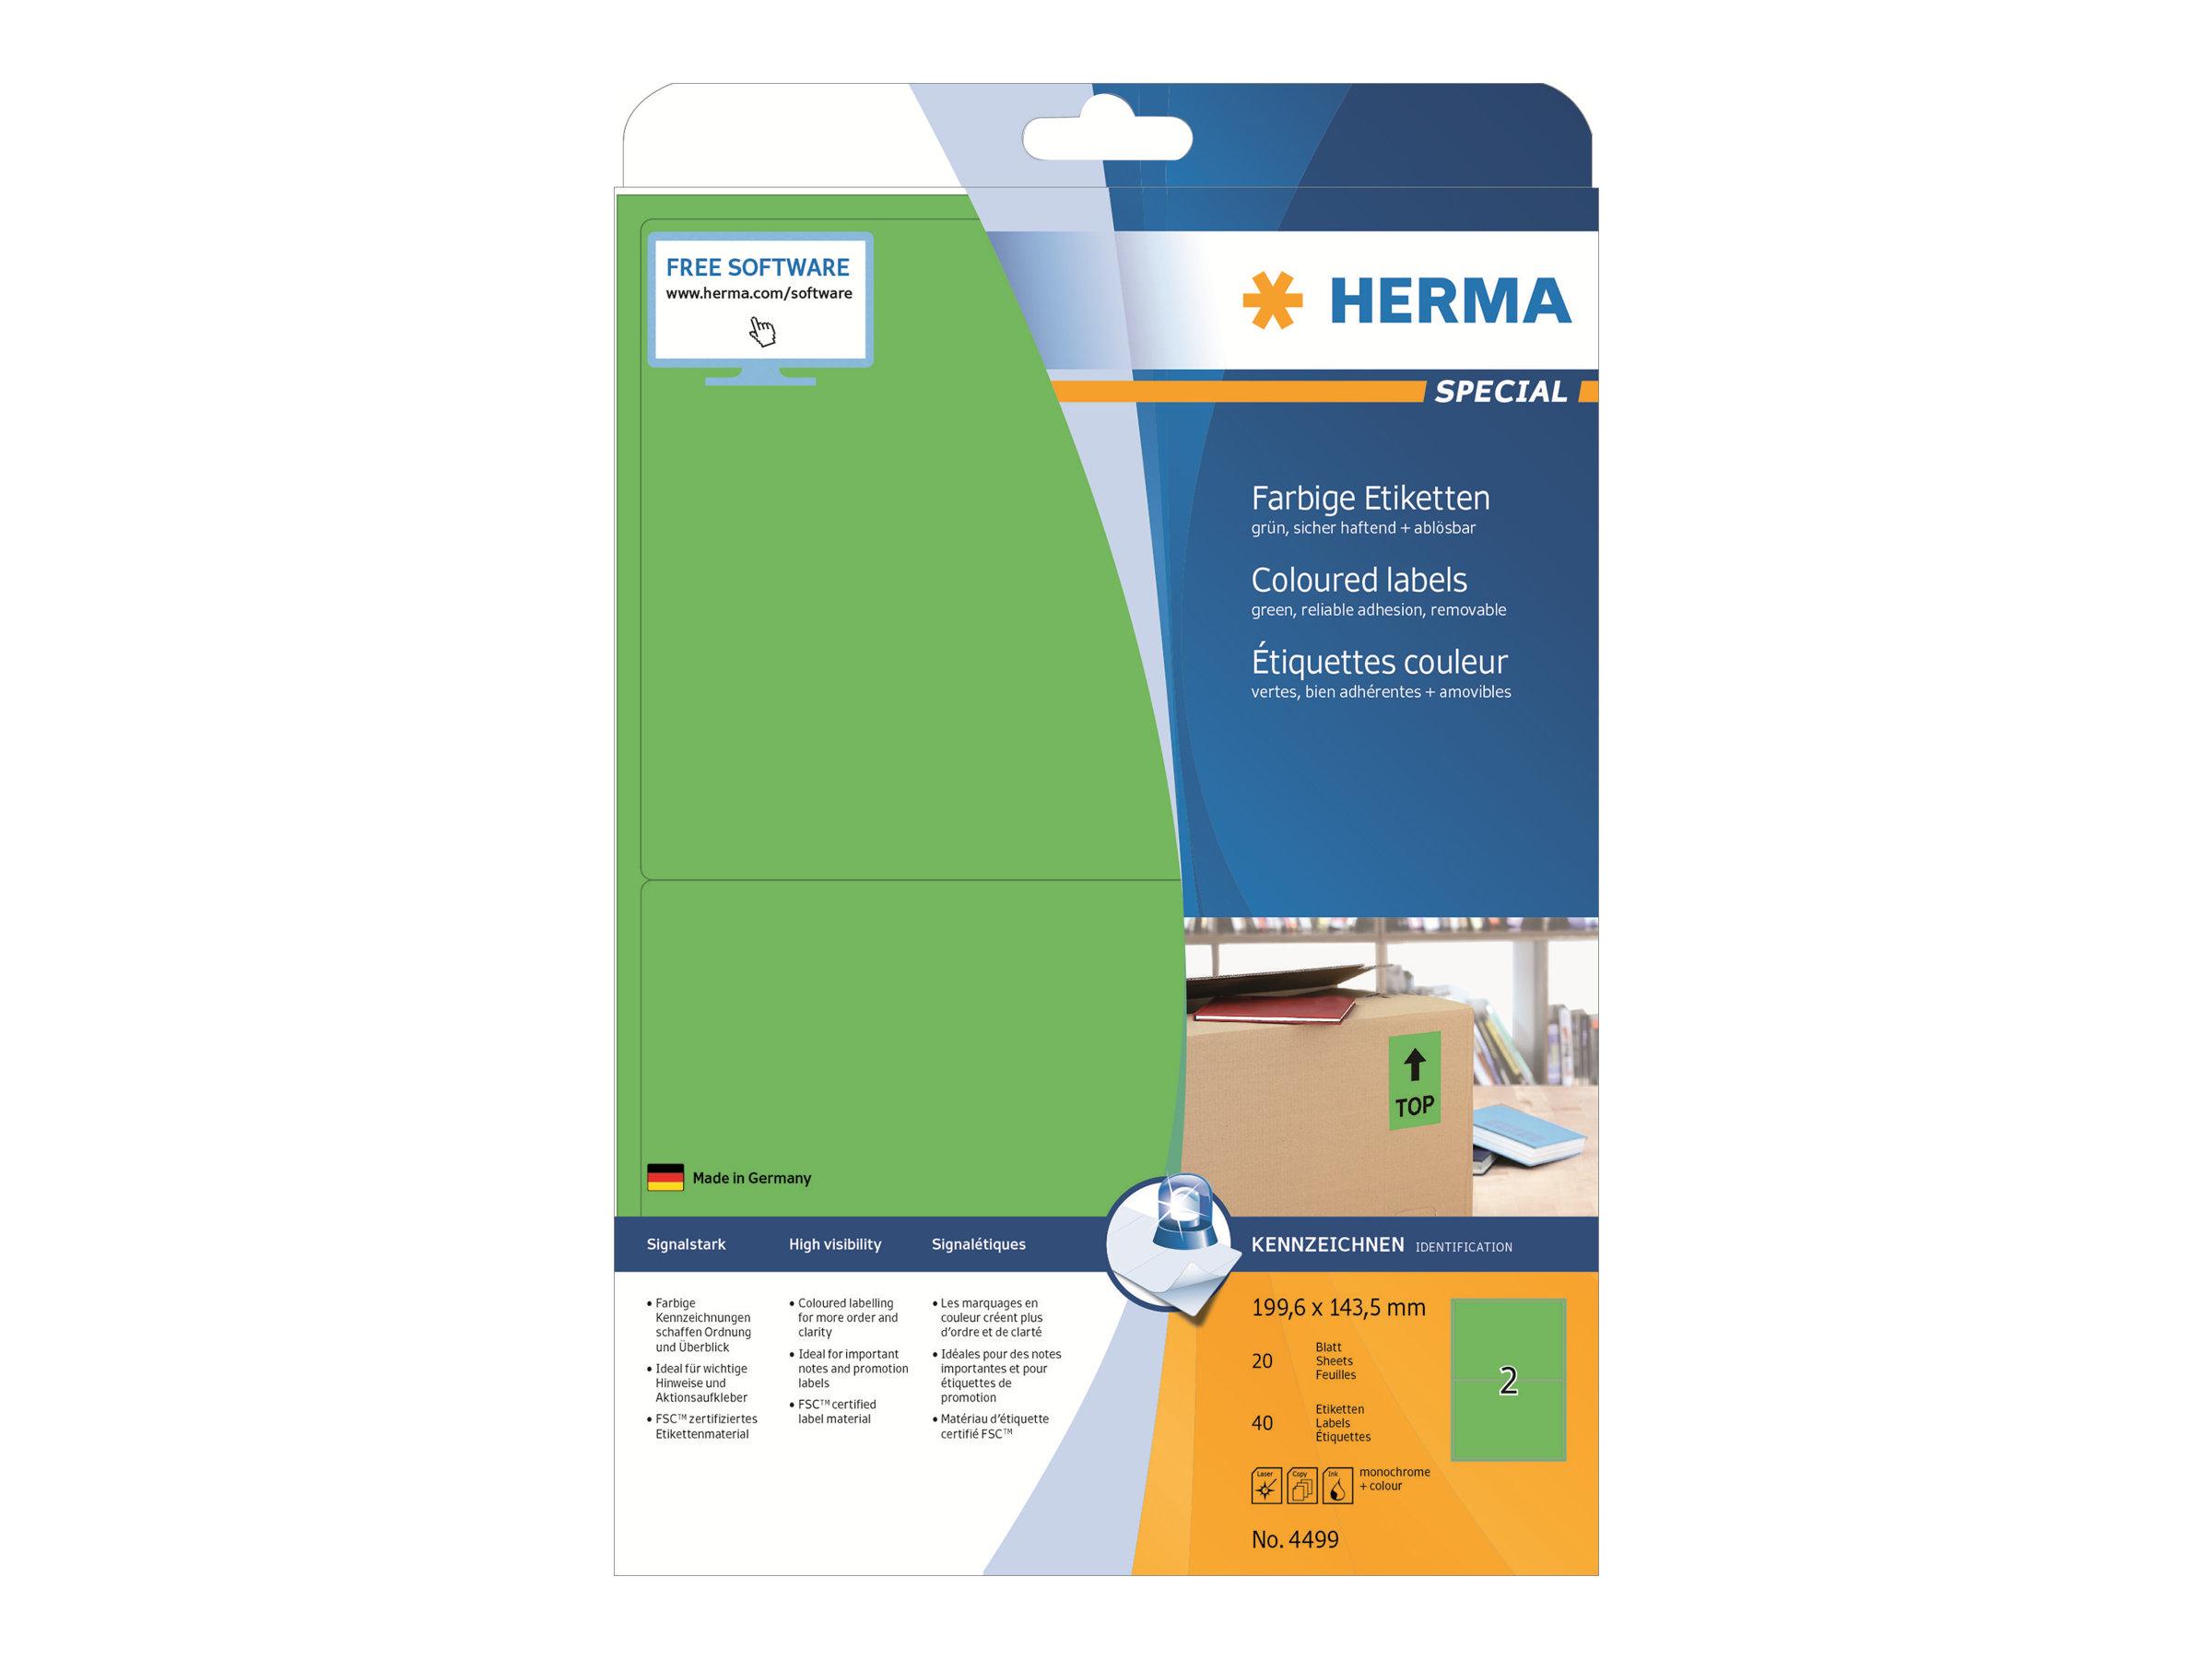 HERMA Special - Papier - permanent selbstklebend - grün - 199.6 x 143.5 mm 40 Stck. (20 Bogen x 2)